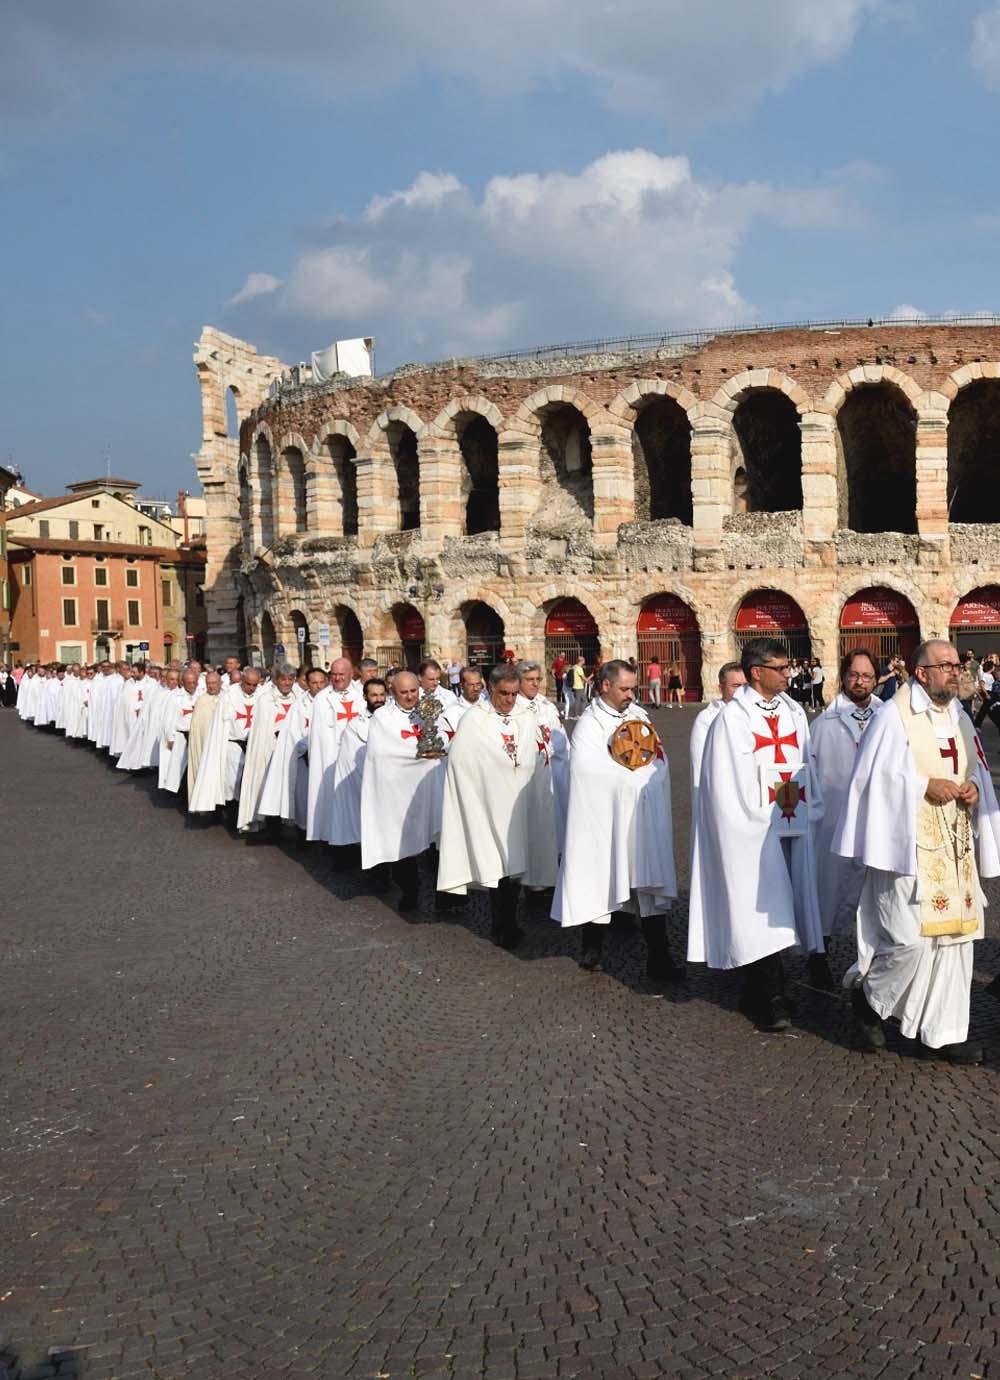 Tours - Following the Templars in Verona (photo 7)